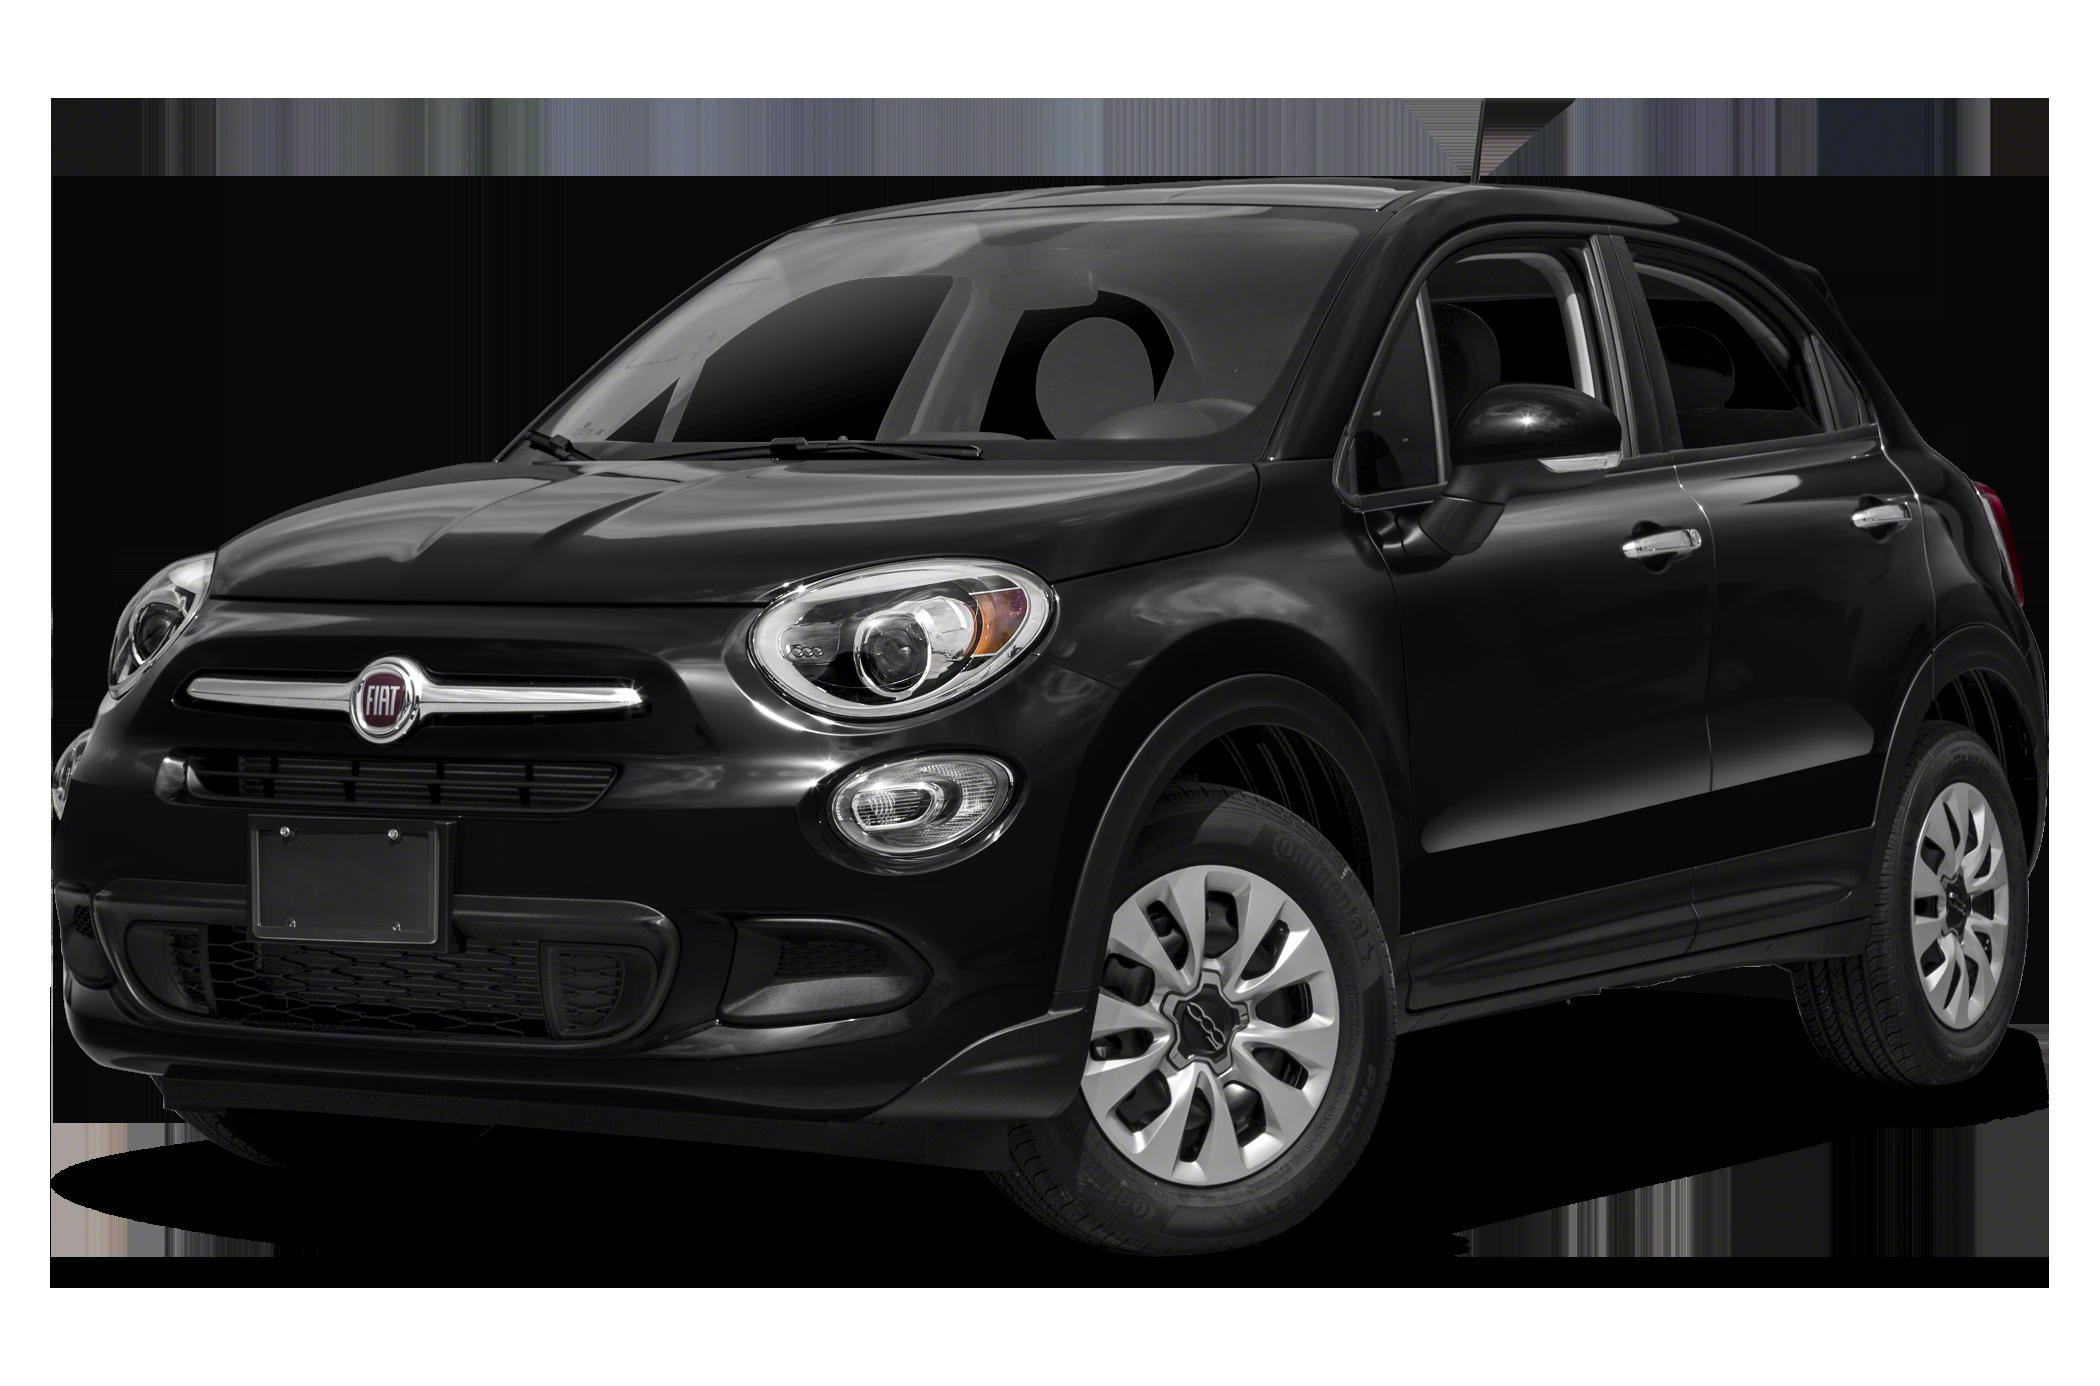 Bob Baker Jeep >> My Car Comparison - CarsDirect.com